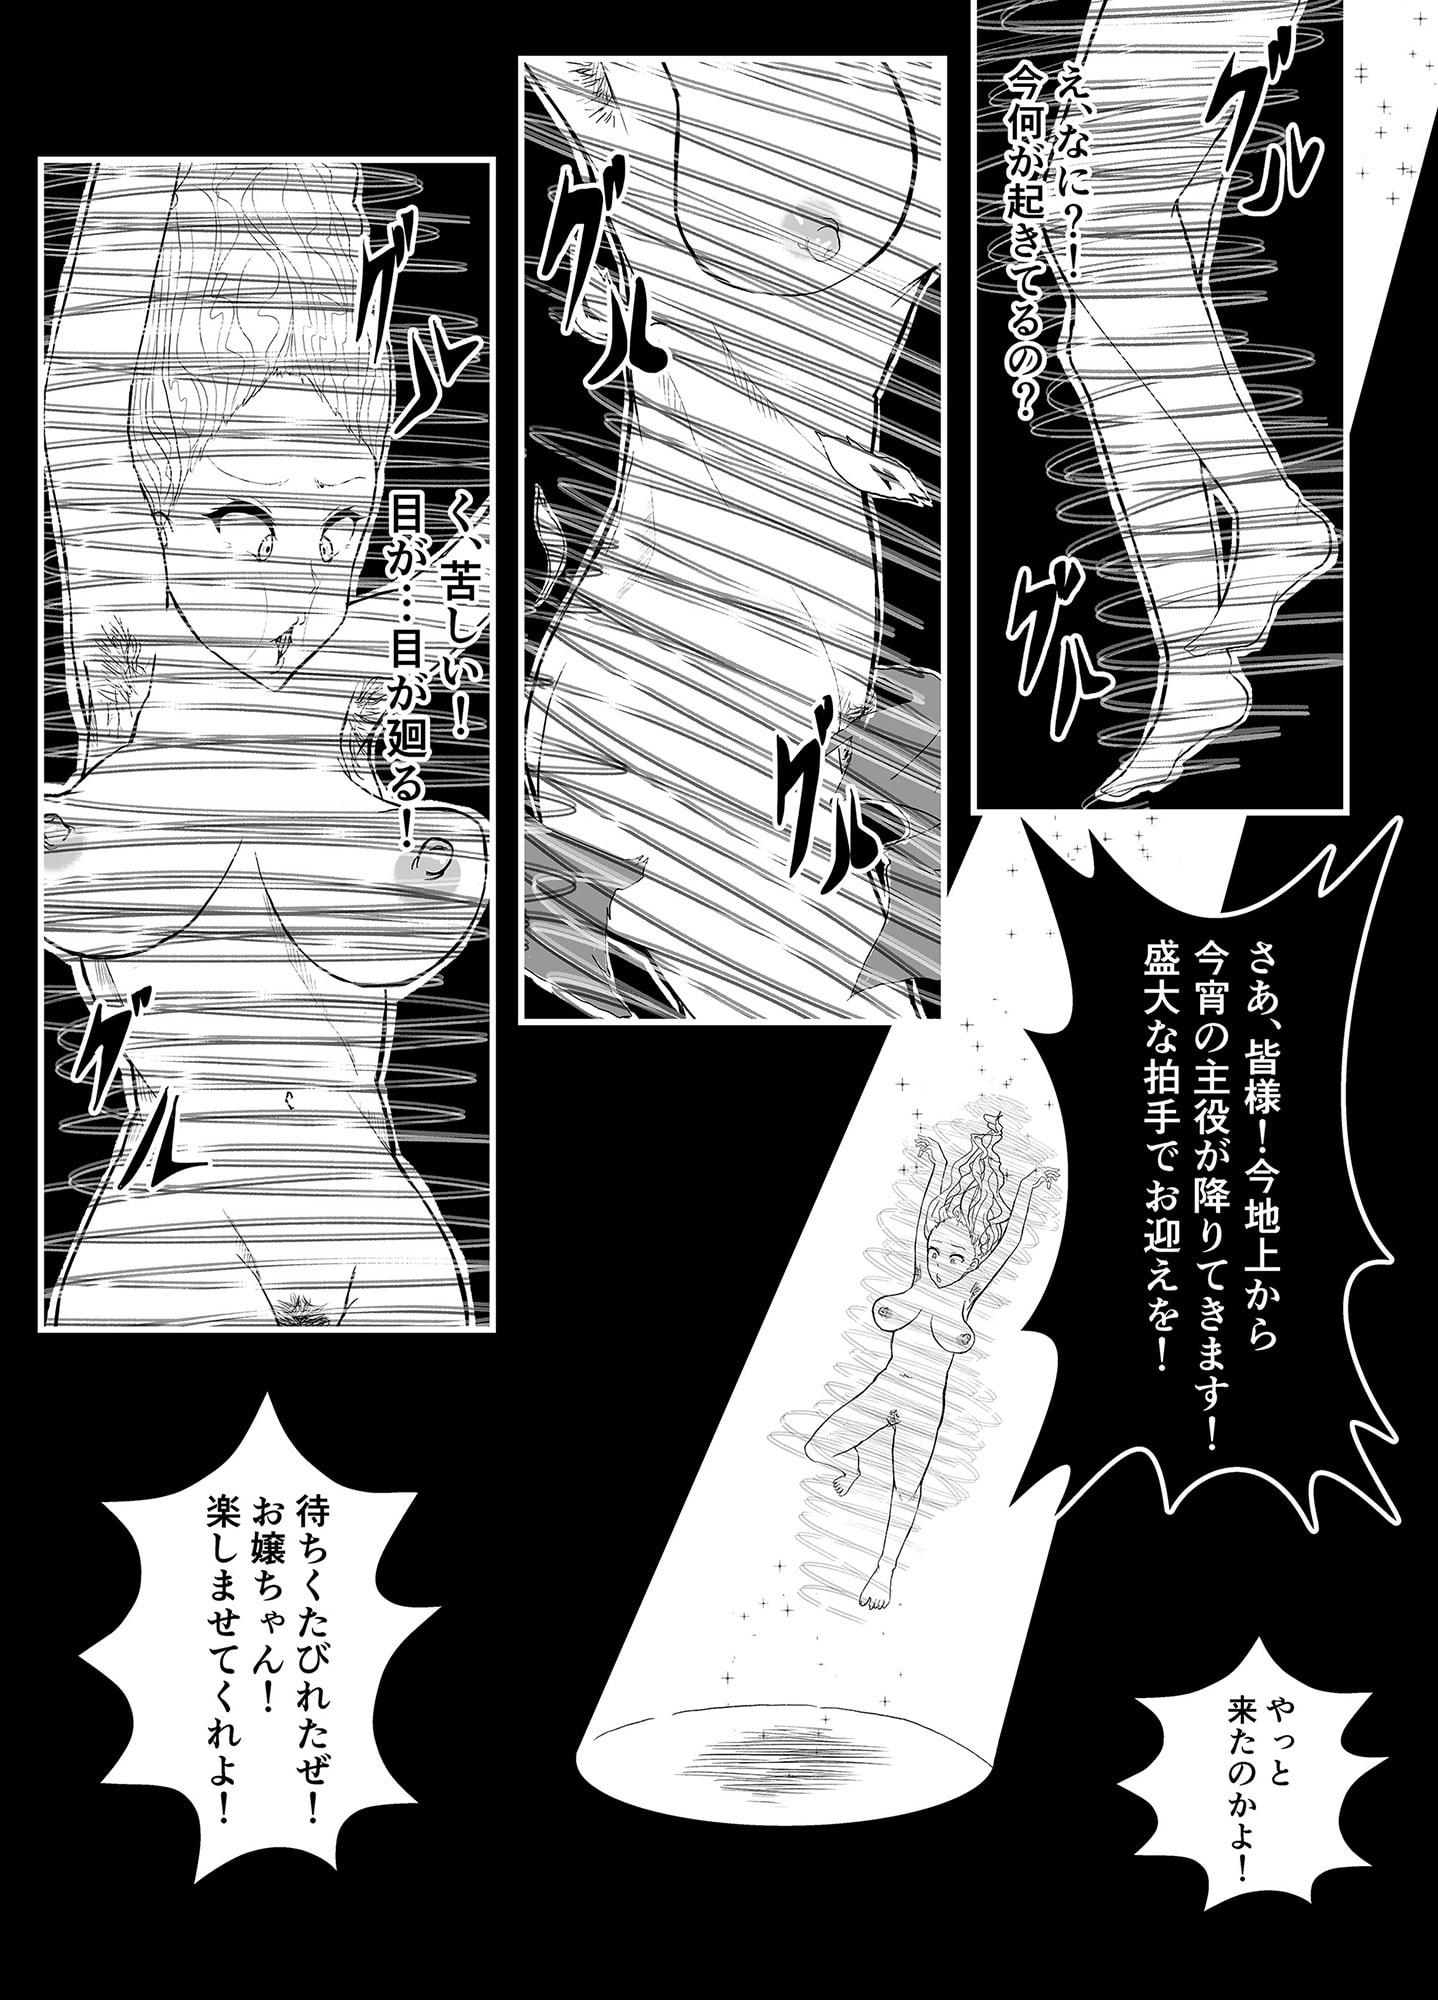 TransfurGirls Auction 03作品 お得パック